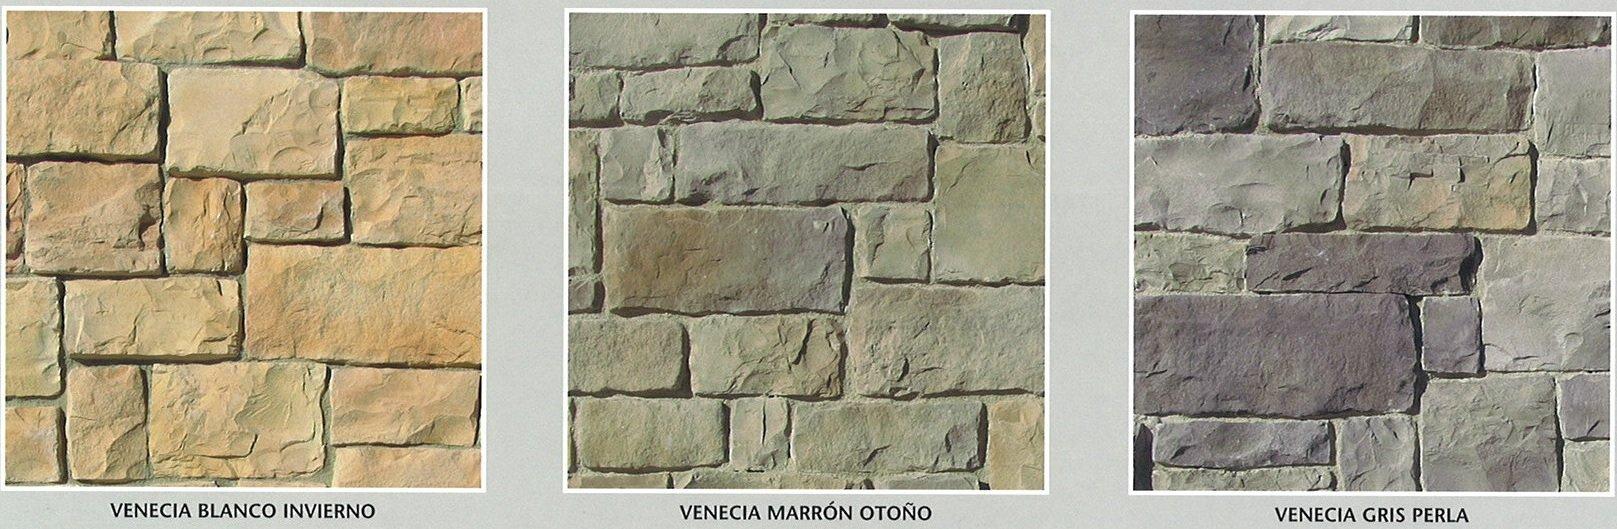 Piedra artificial decorativa modelo venecia cemat gijon - Piedra artificial madrid ...